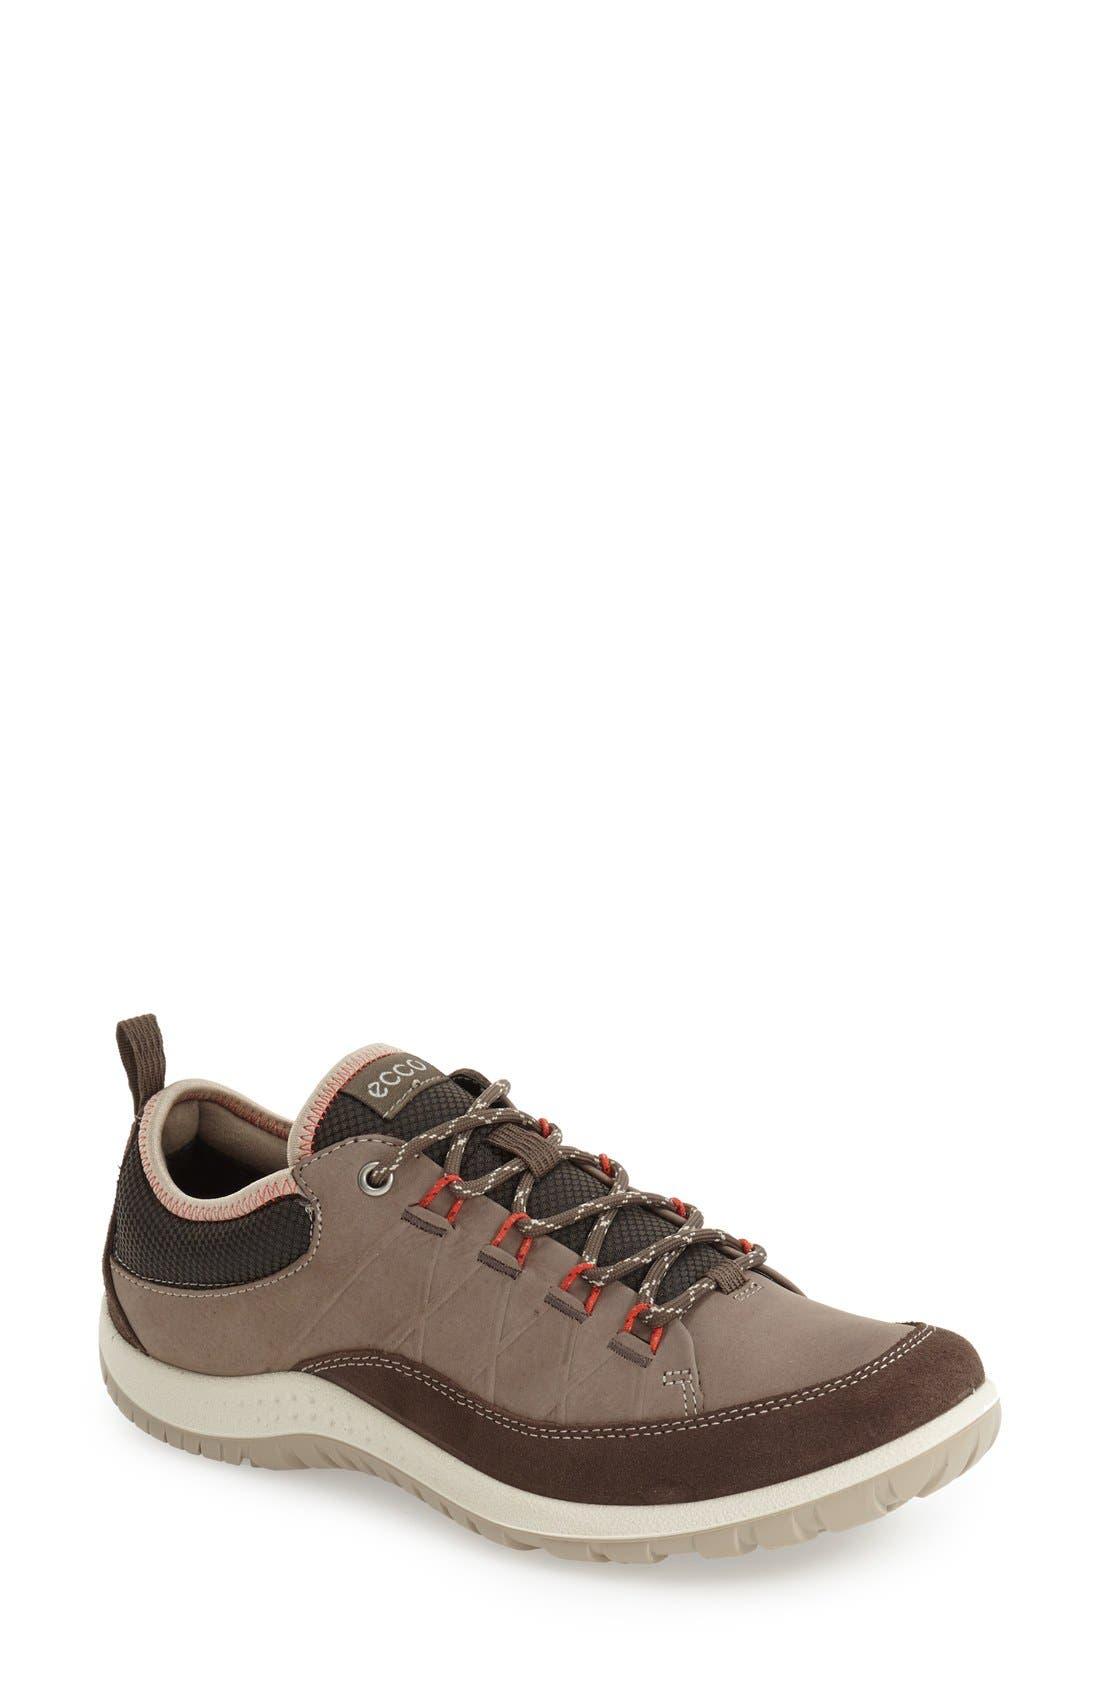 'Aspina' Sneaker,                             Main thumbnail 1, color,                             Dark Clay Oiled Suede